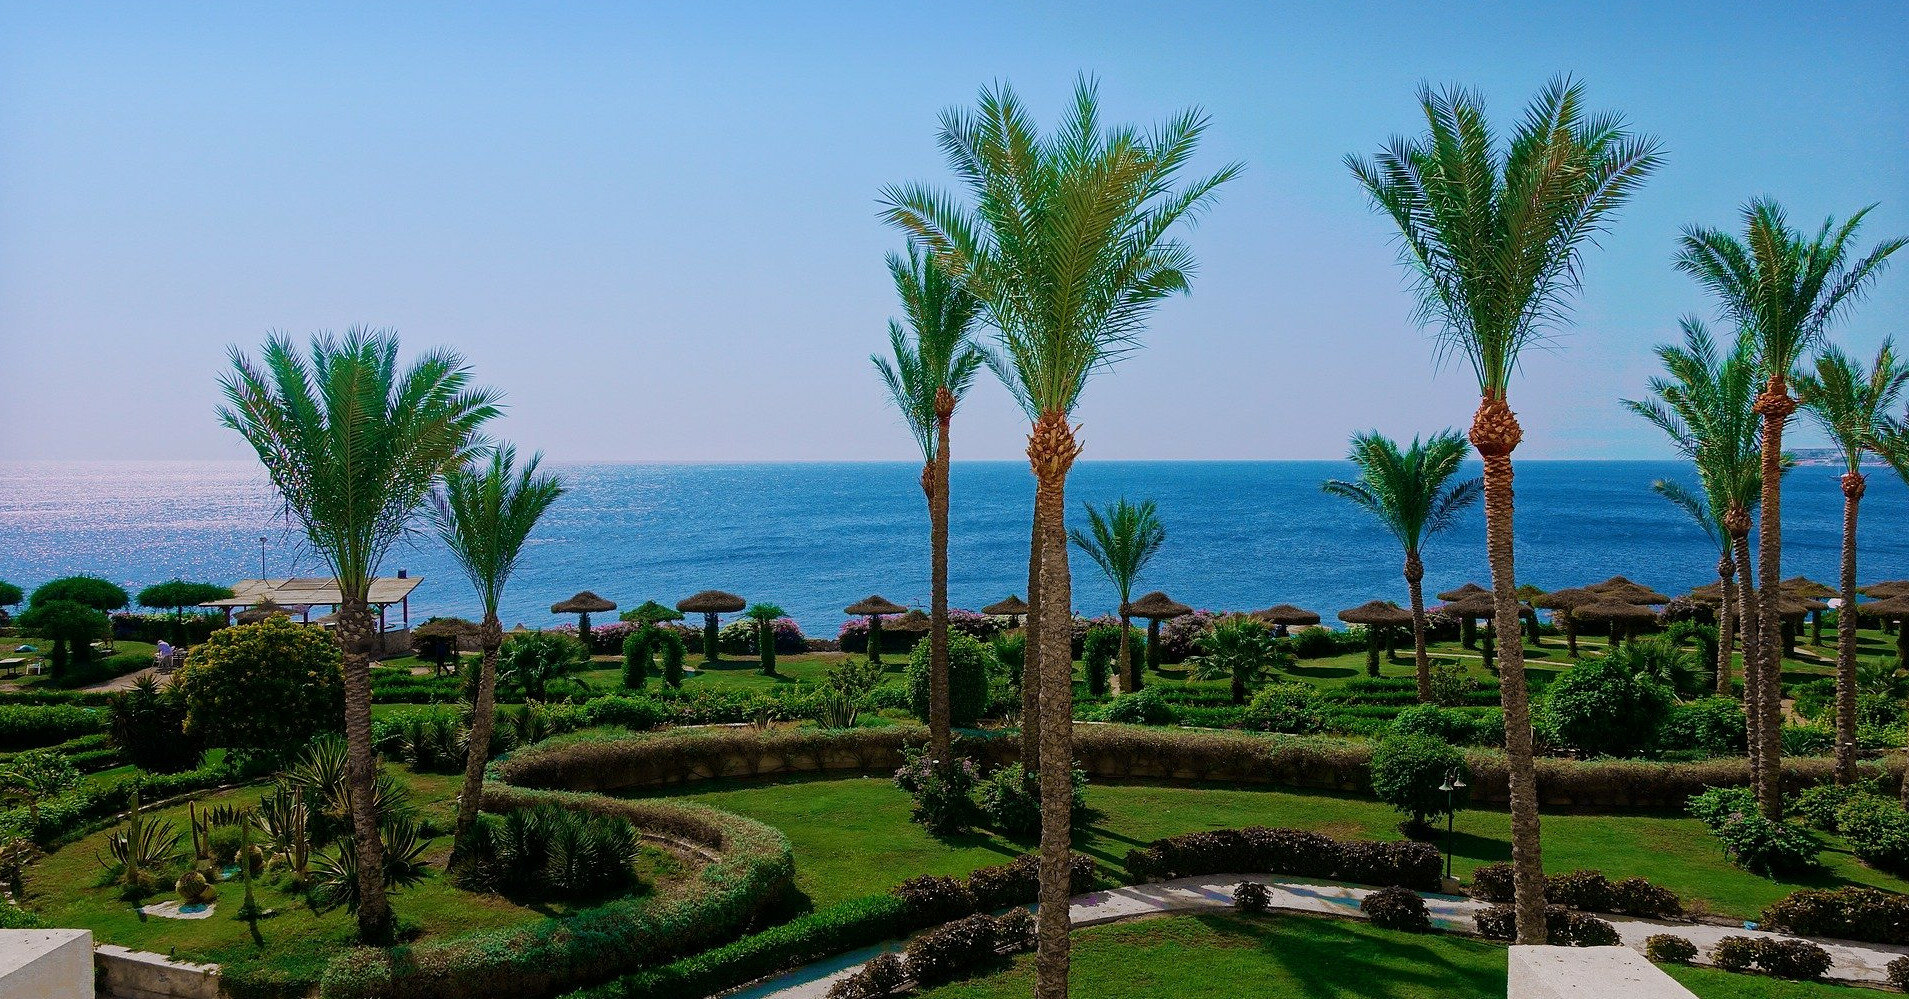 В Египте отменят ограничения на работу ресторанов и магазинов: названа дата